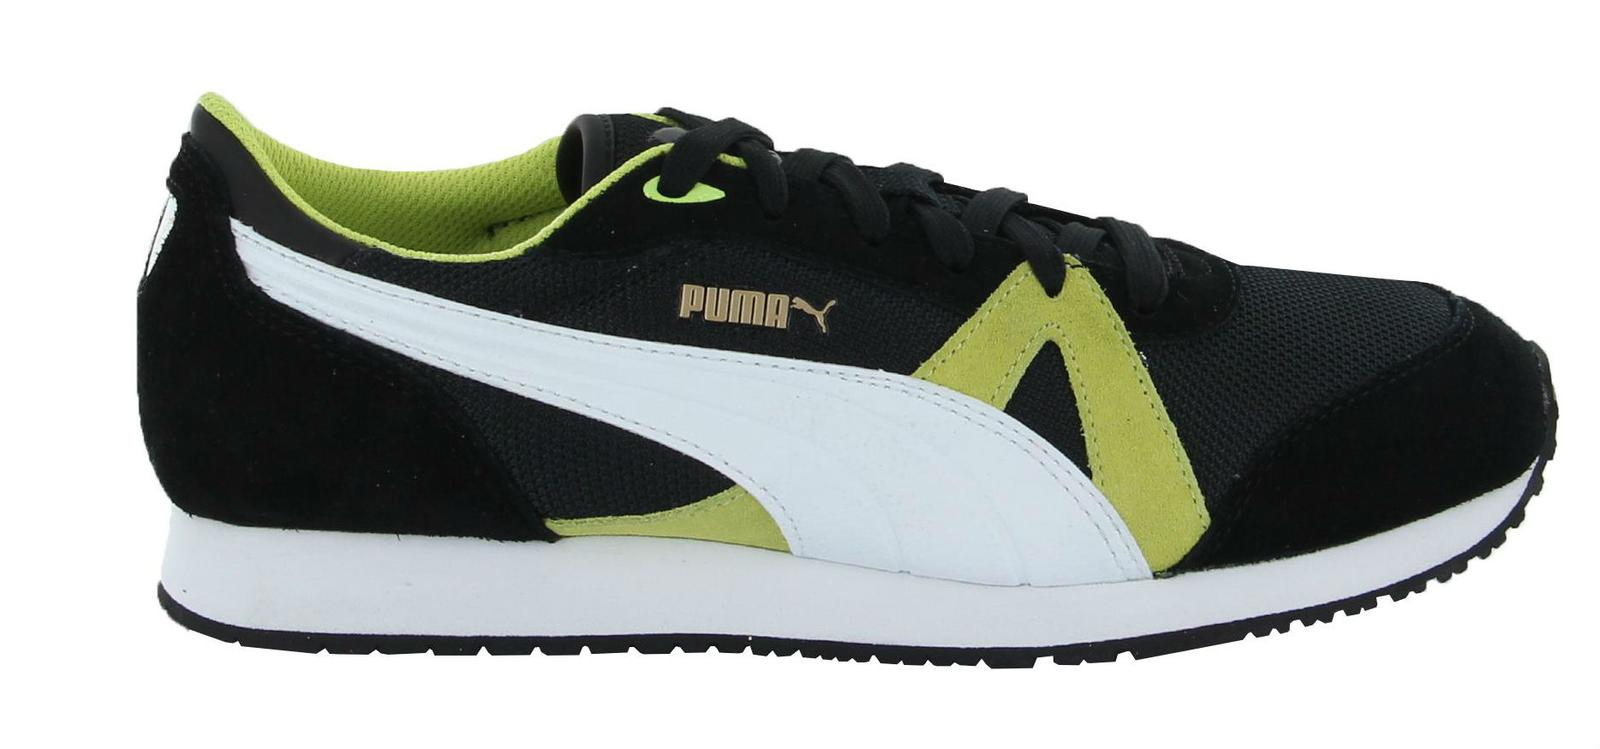 PUMA-TF-Racer Mesh black-white-sharp green  2cb93aeb96